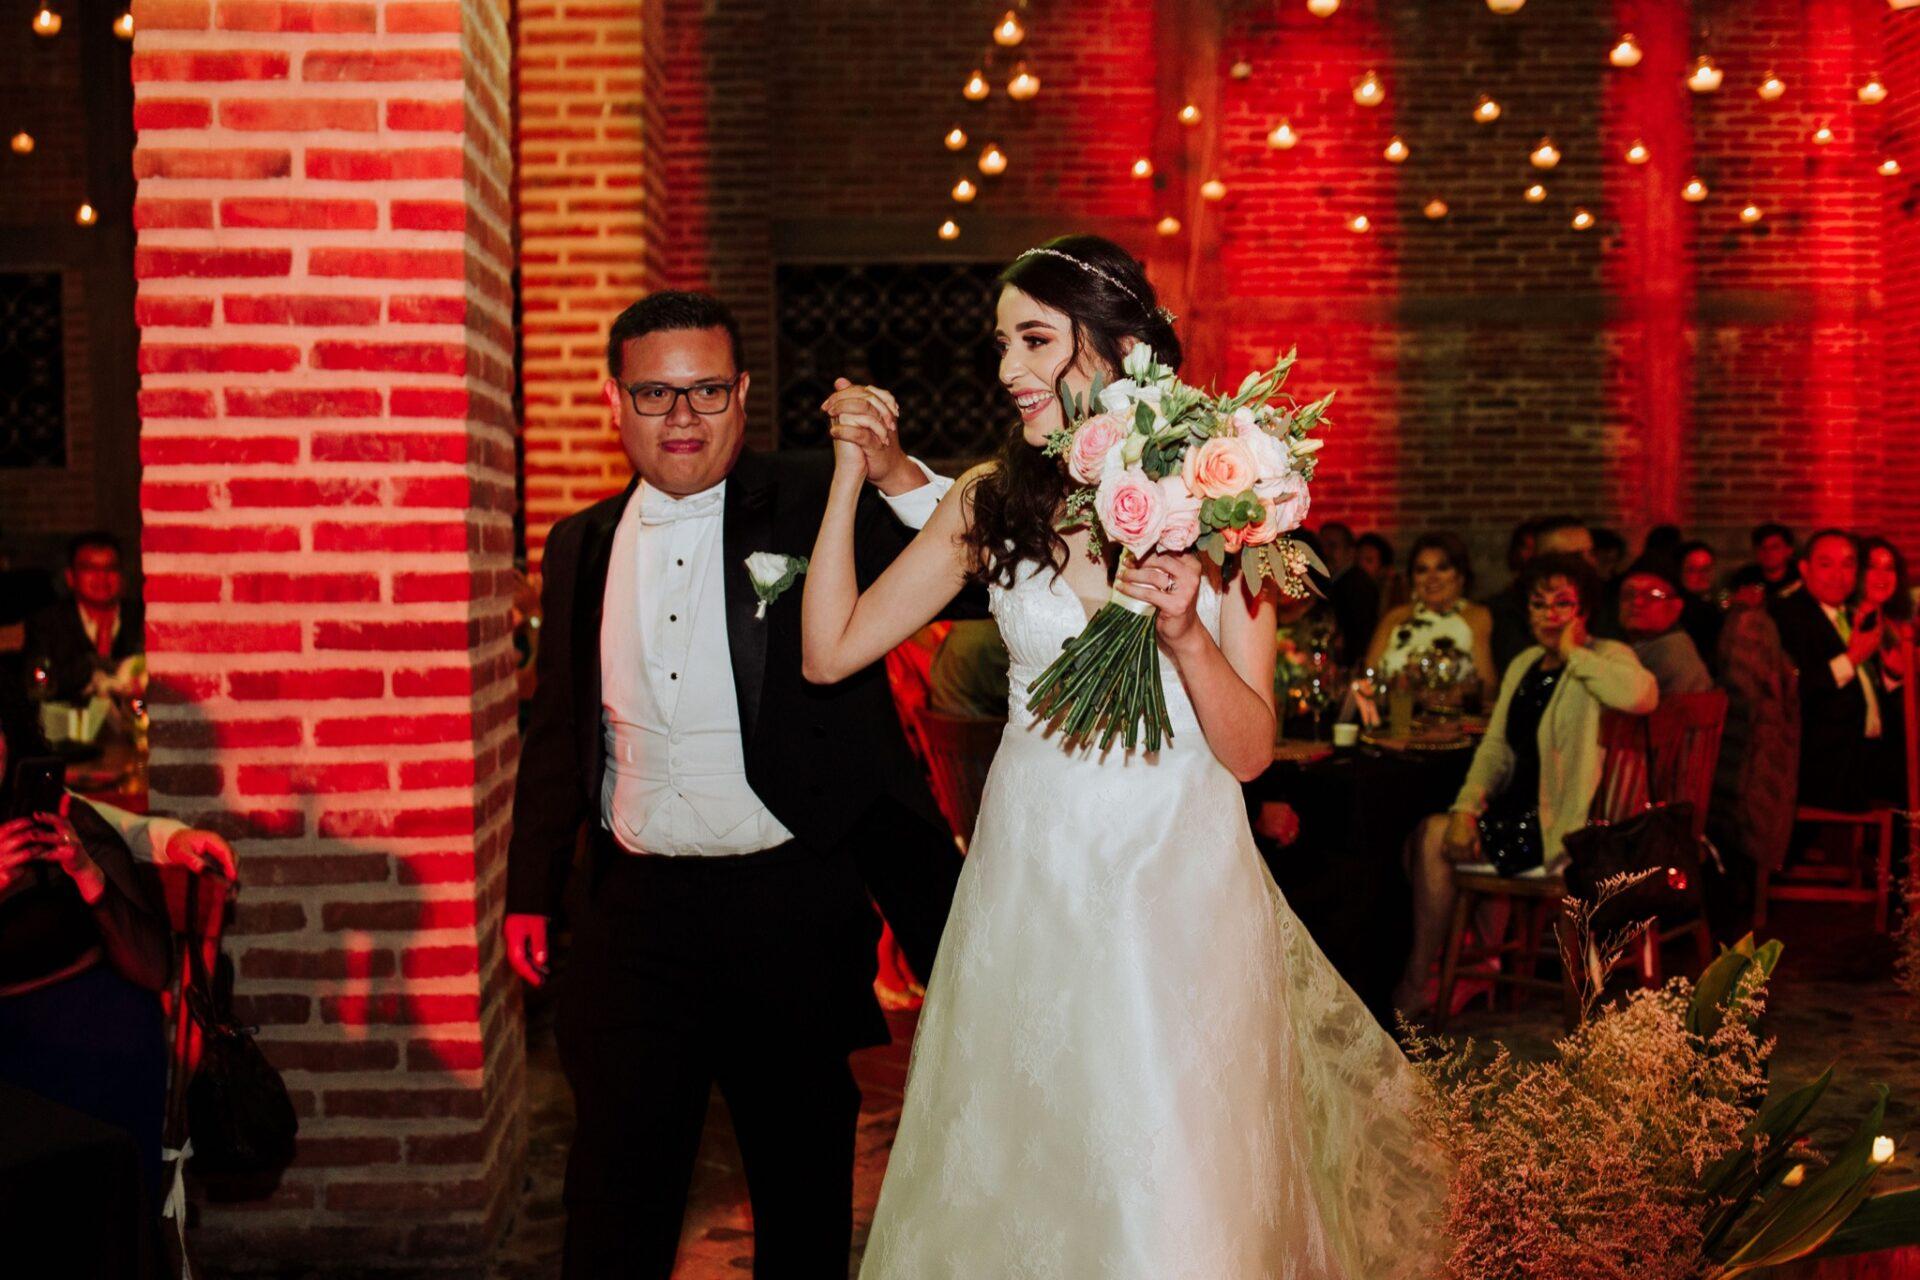 javier_noriega_fotografo_bodas_teul_zacatecas_wedding_photographer34